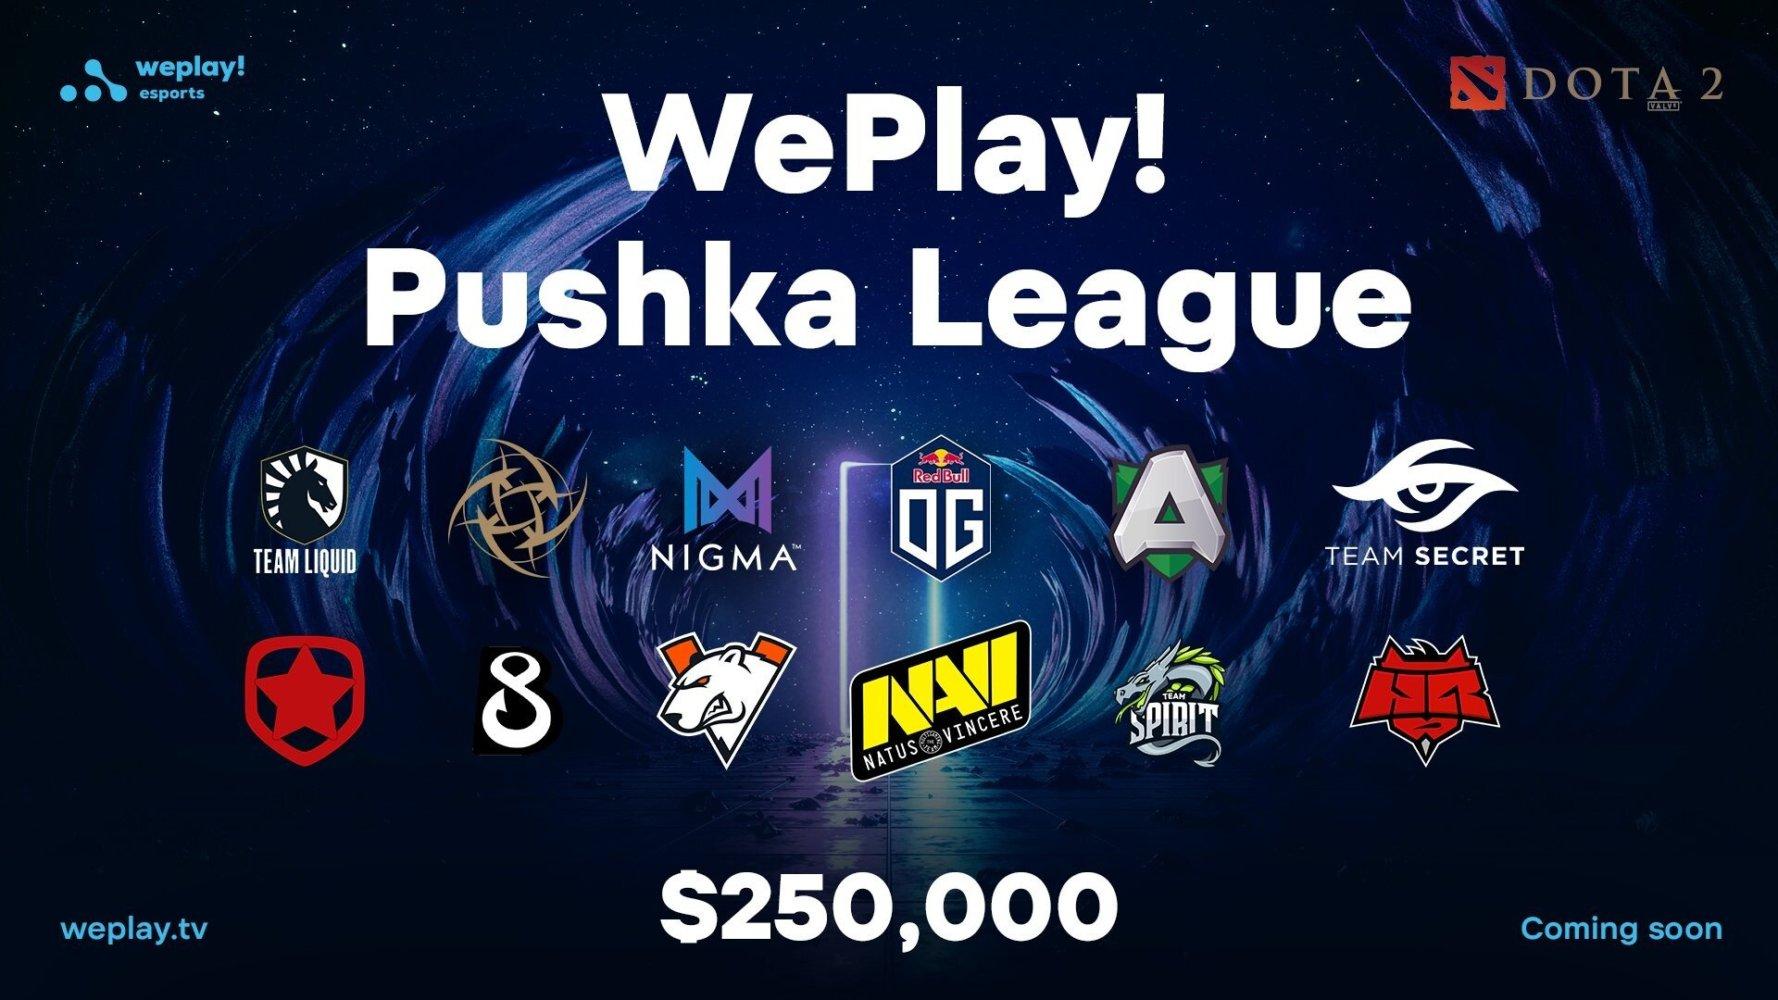 we play! pushka league